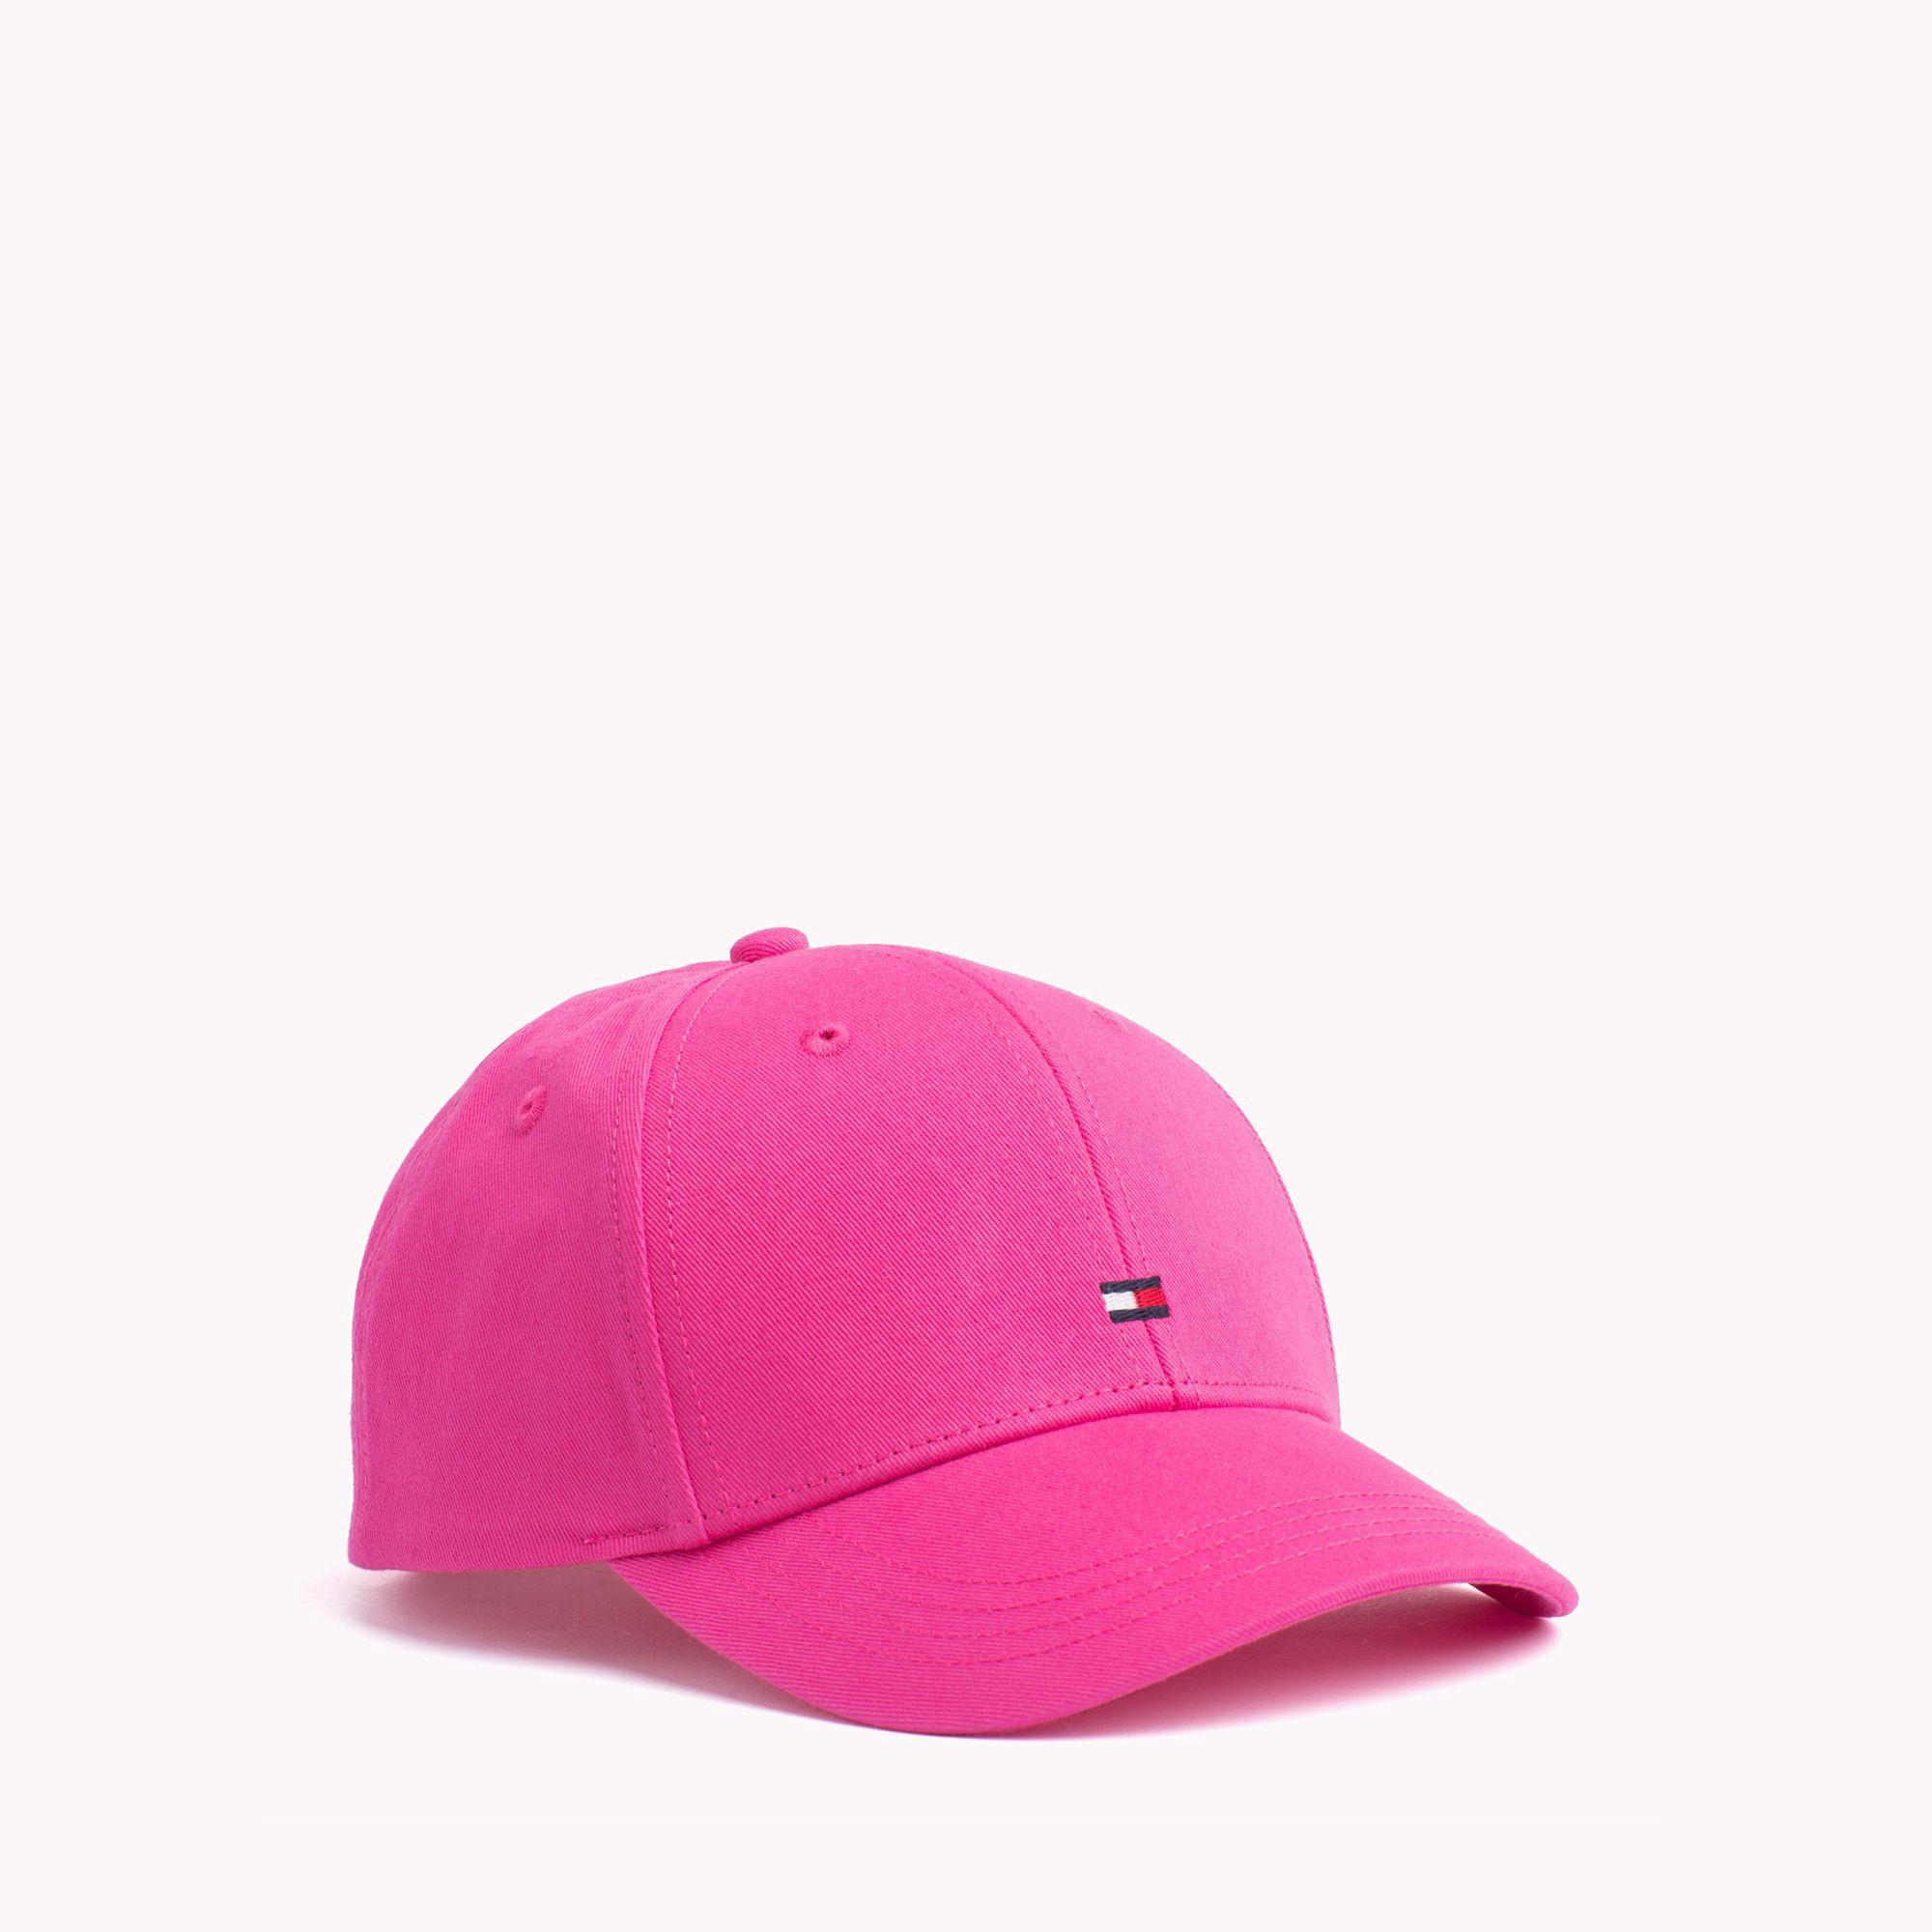 Tommy Hilfiger Th Kids Classic Baseball Cap - Pink Flambe M in 2019 ... 697b53ff0a0a